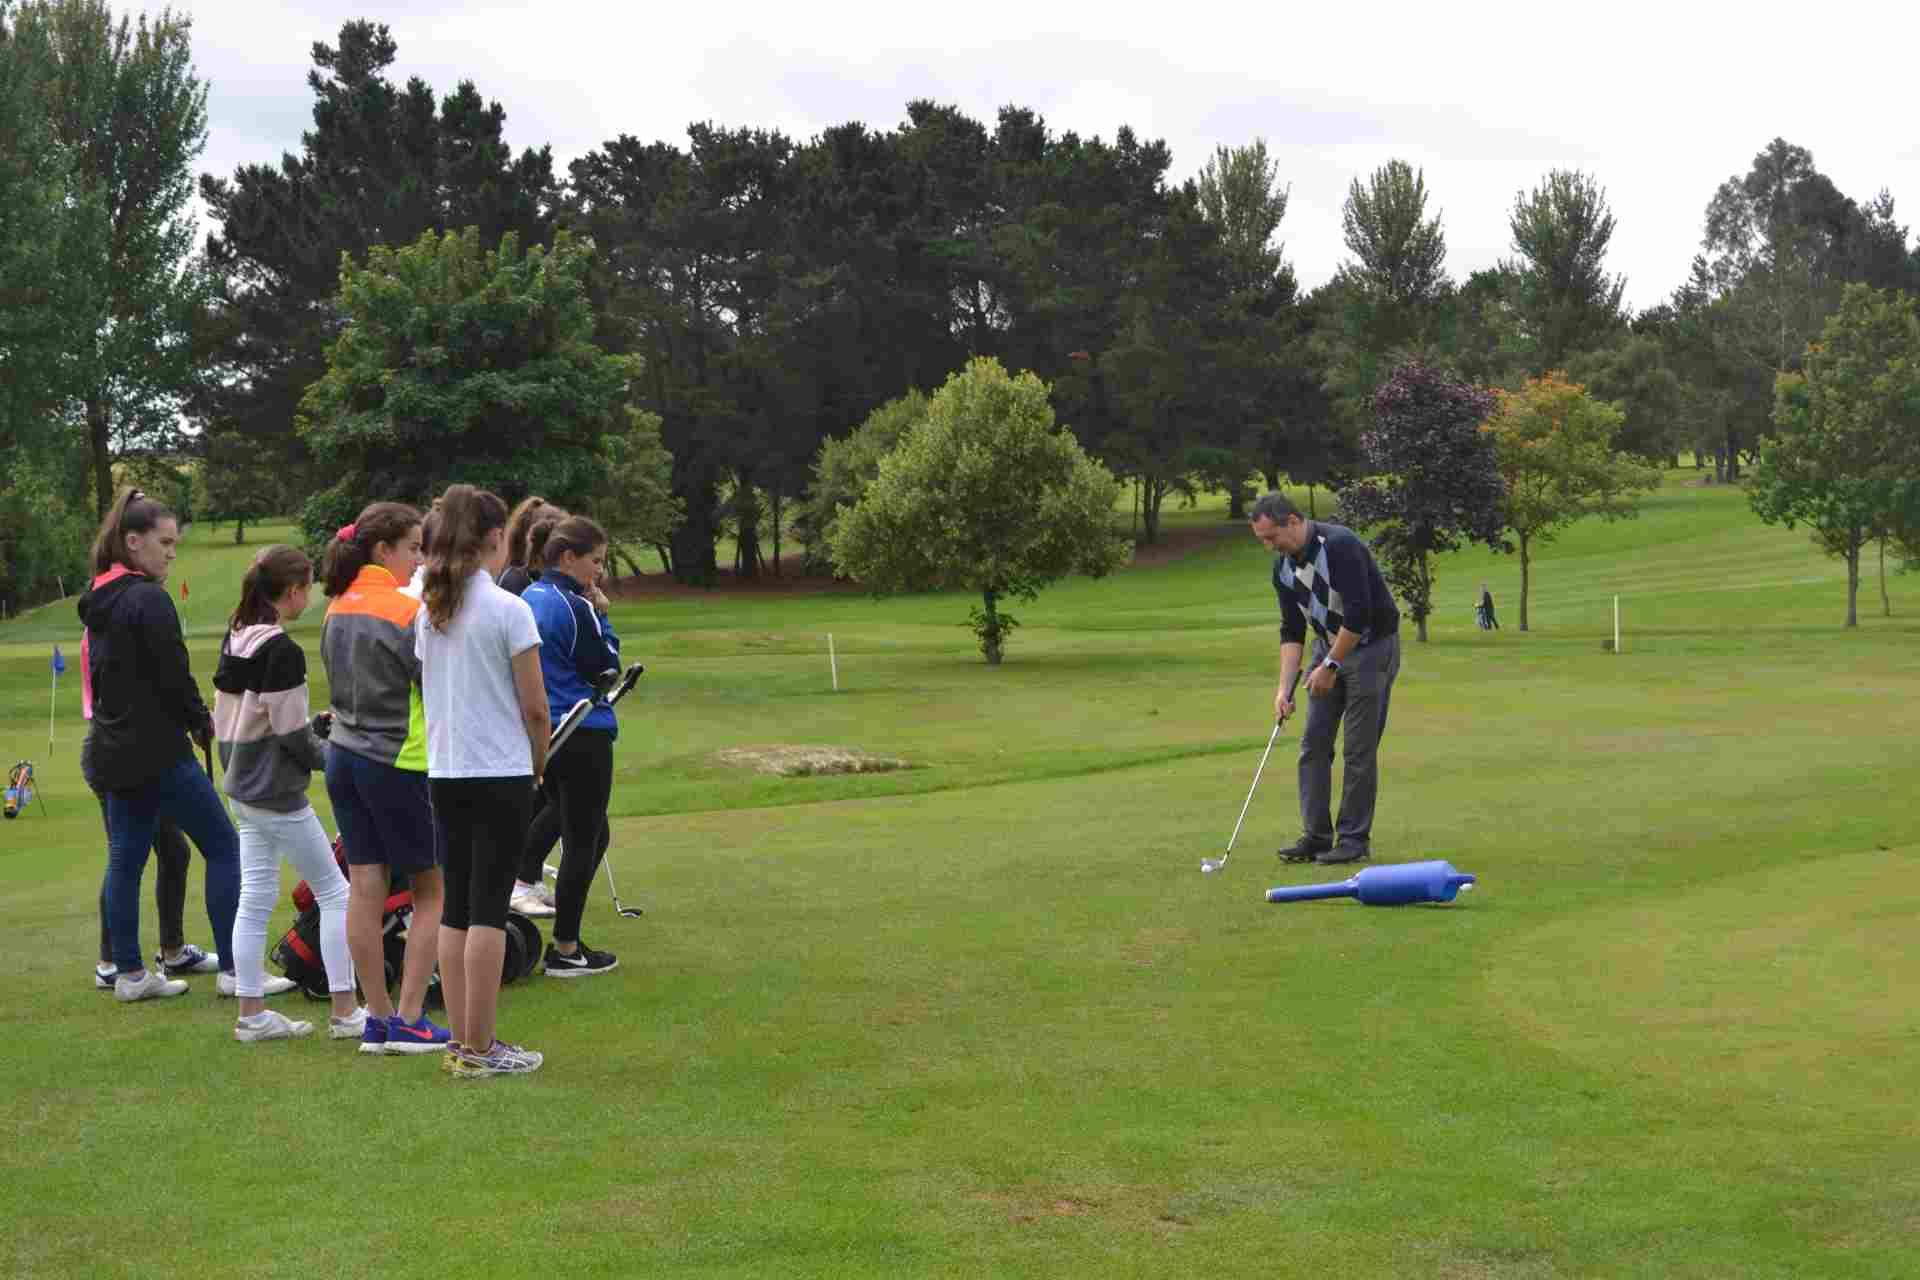 About Junior Club Skerries Golf Club